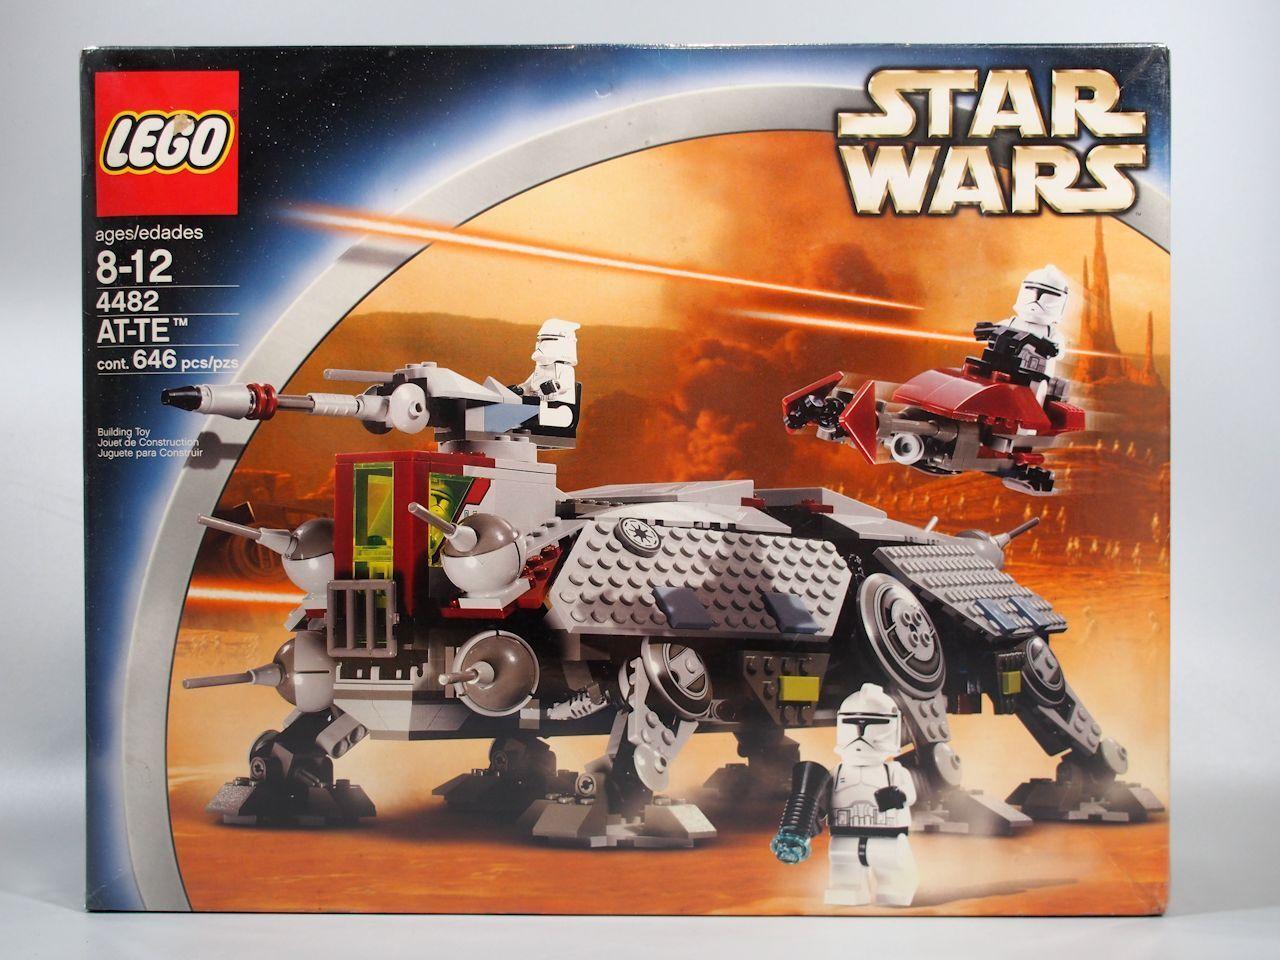 LEGO LEGO LEGO 4482 Star Wars AT-TE NEW & SEALED 7c2326